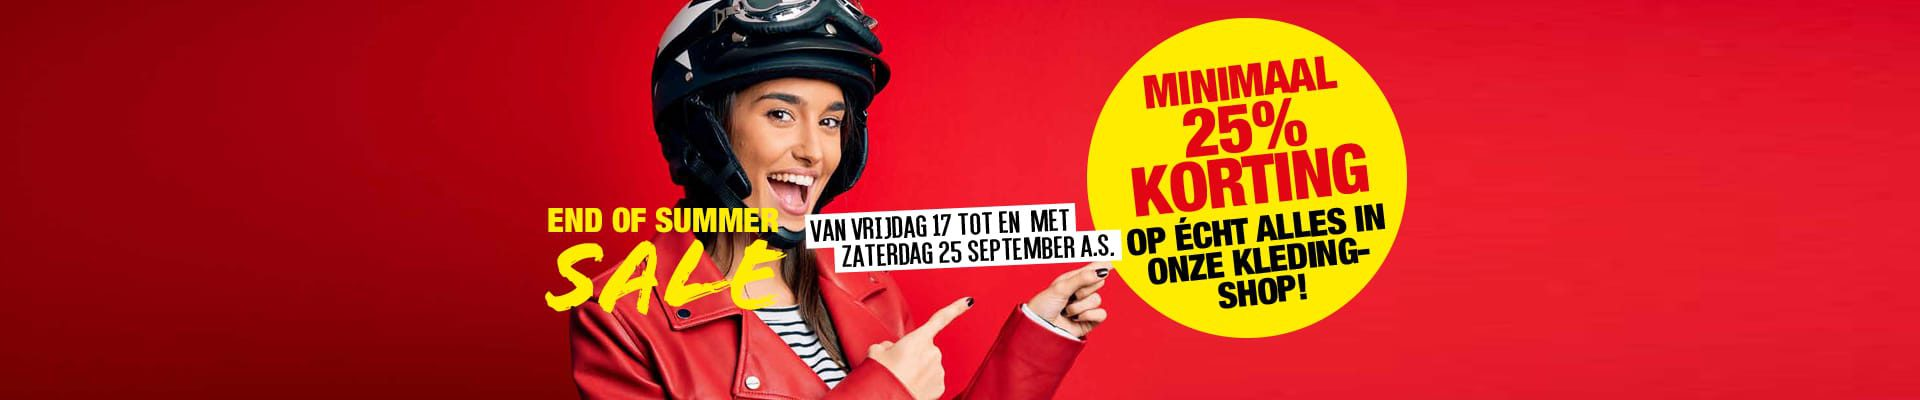 2021-08-30_arie-molenaar-motors_slider_end-of-summer-sale_v02